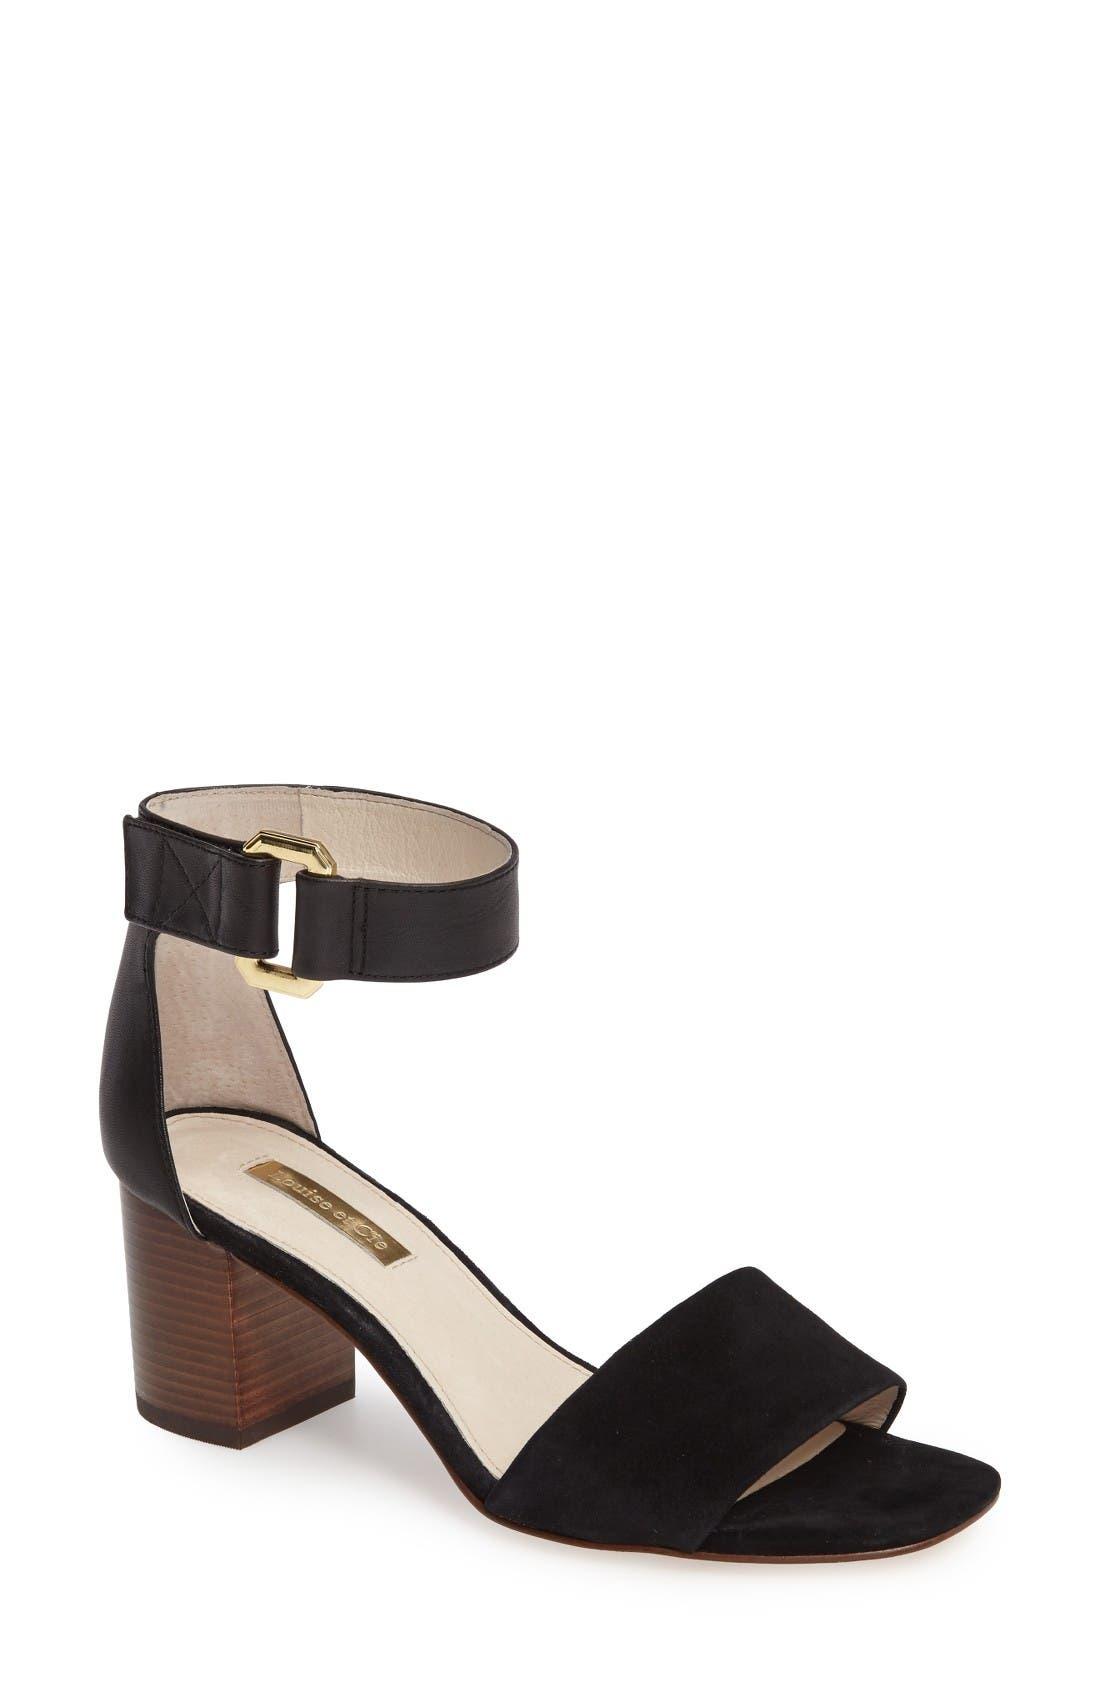 LOUISE ET CIE Kambria Block Heel Sandal